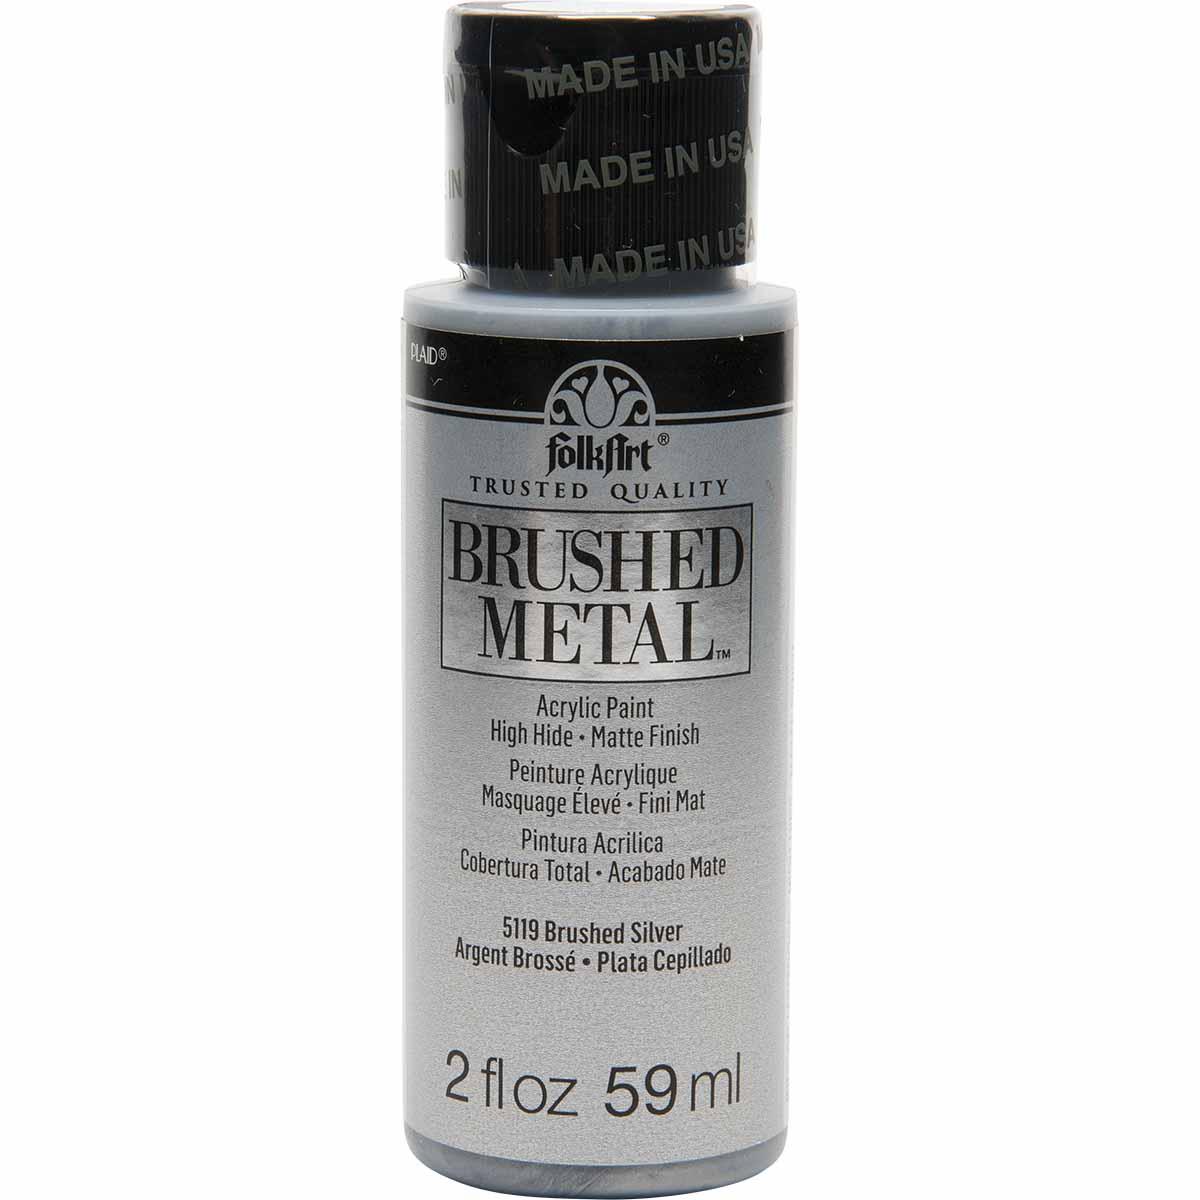 FolkArt ® Brushed Metal™ Acrylic Paint - Silver, 2 oz. - 5119